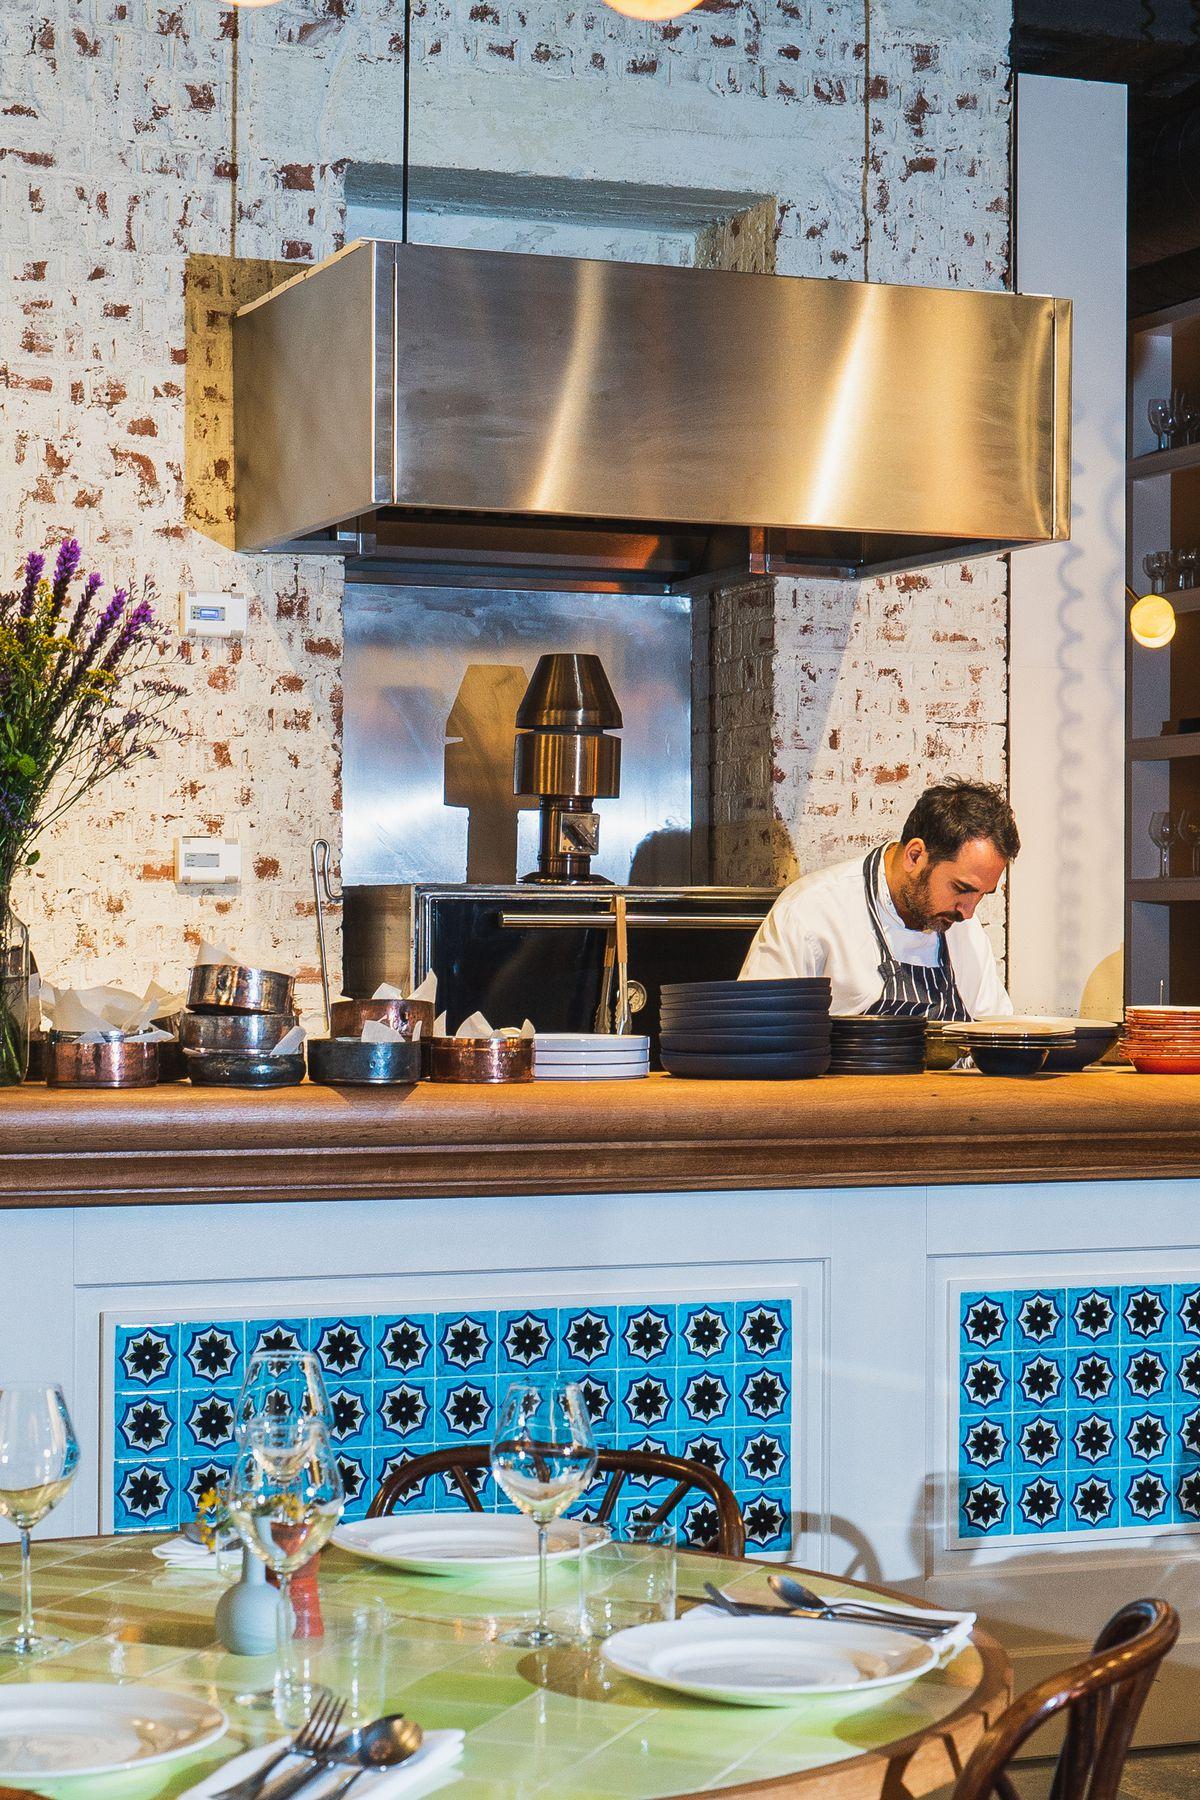 Yeni restaurant in Soho, London, from Yeni Lokanta Istanbul chef Civan Er